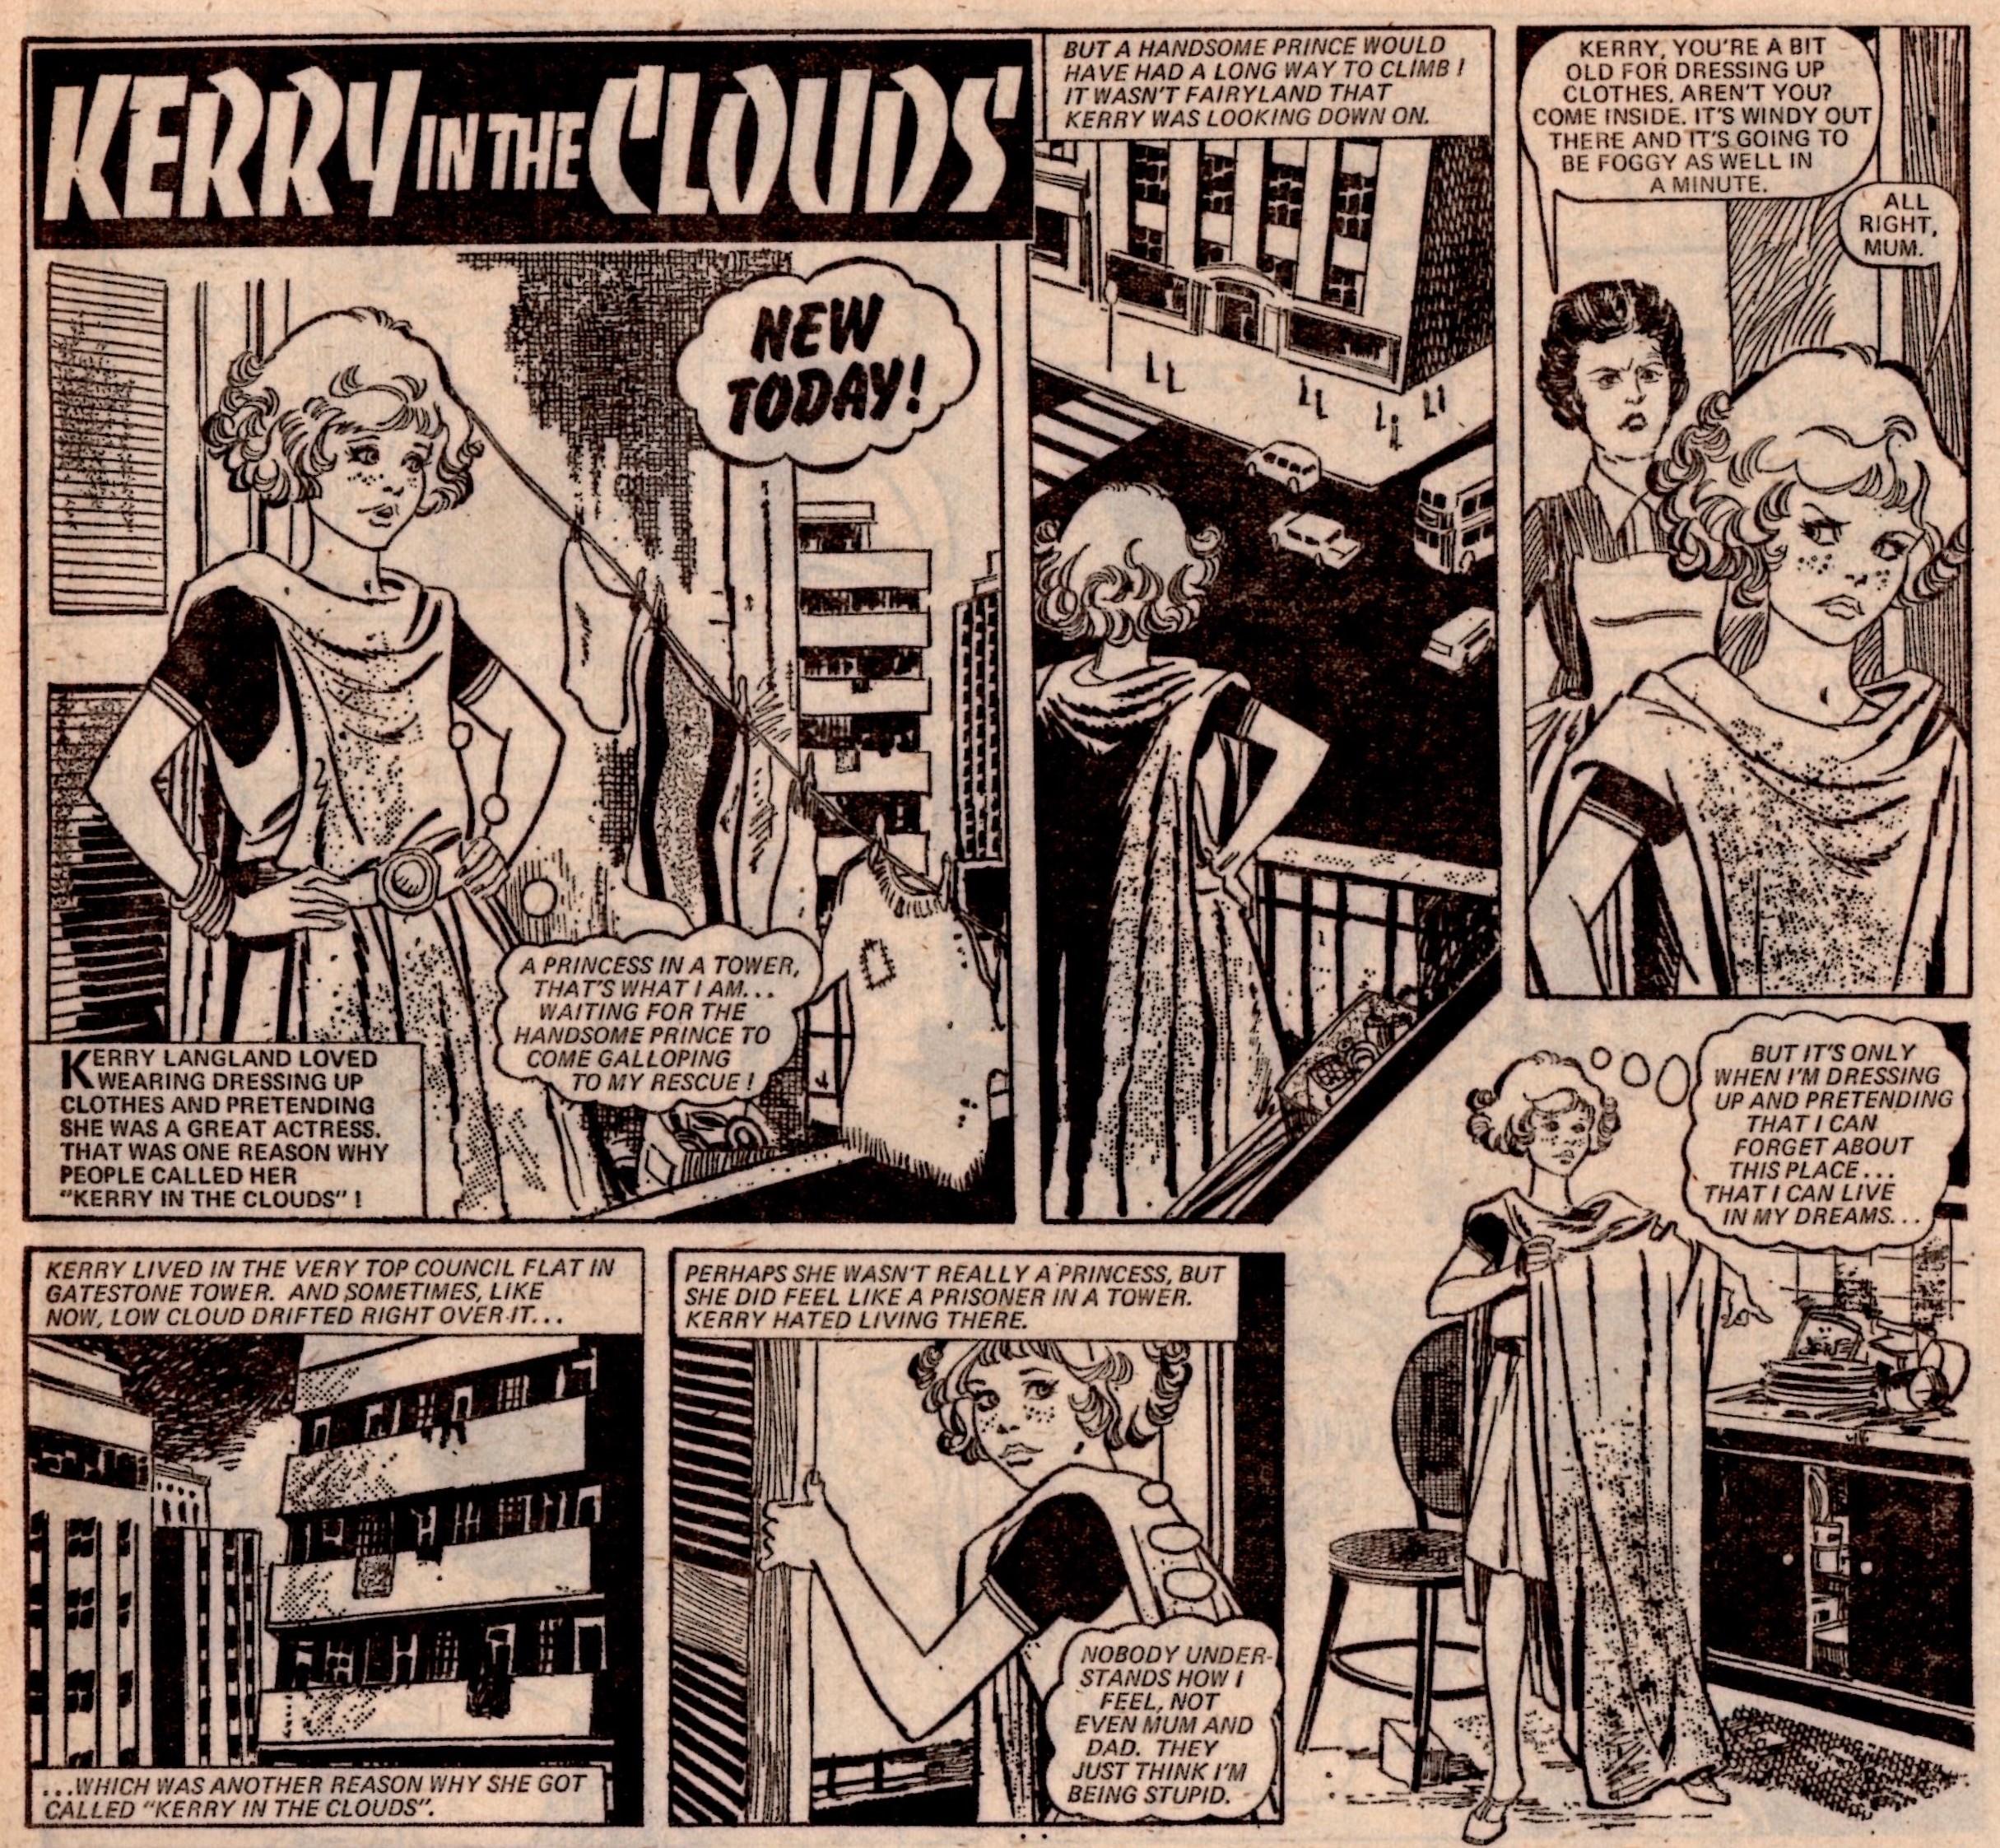 Kerry in the Clouds: Alan Davidson (writer), Candido Ruiz Pueyo (artist)